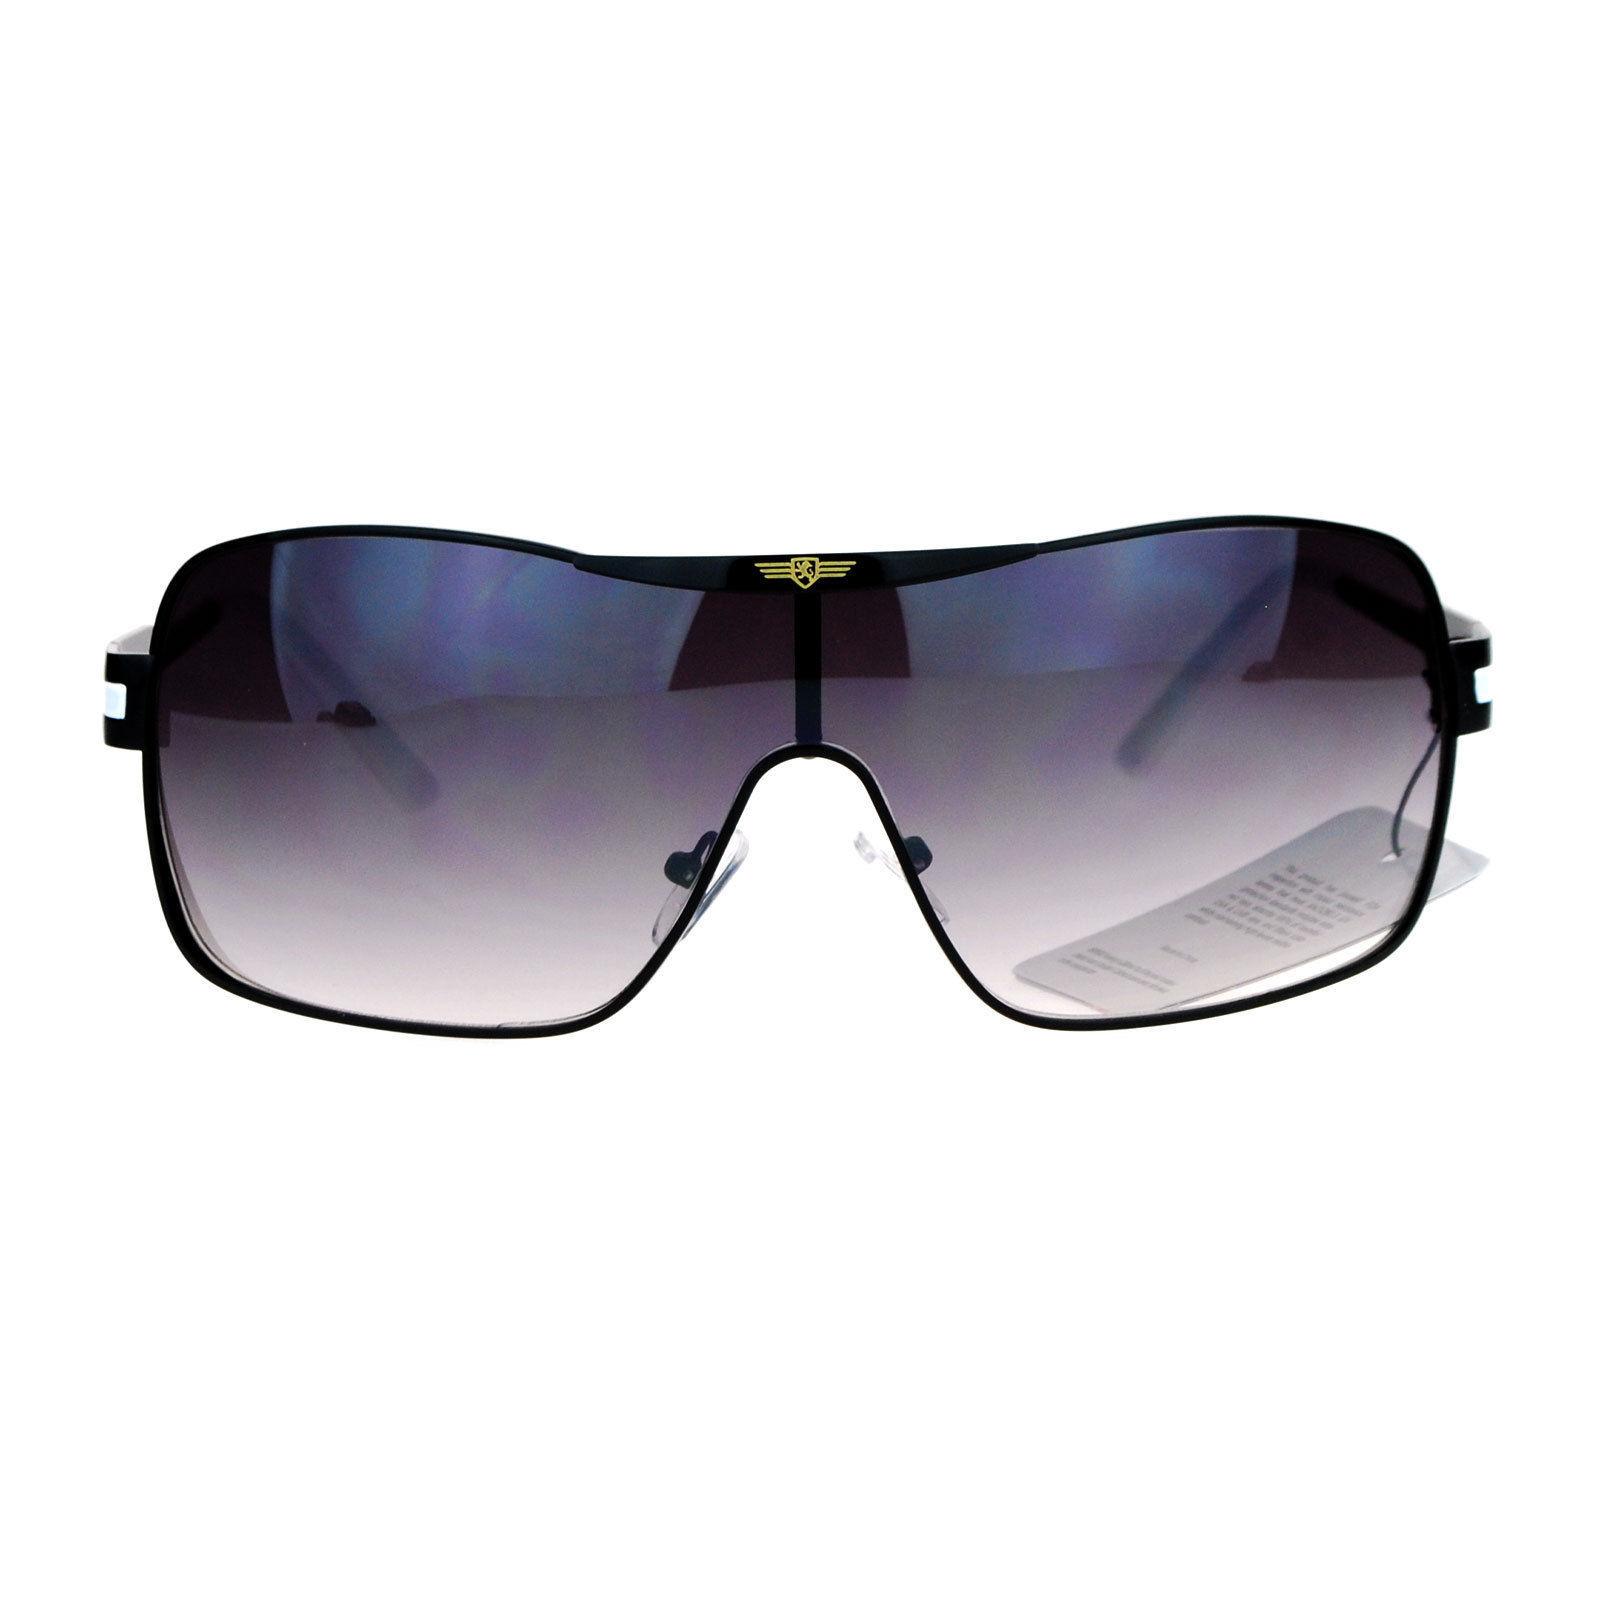 38d206611aa9 ... Khan Sunglasses Mens Shield Rectangular Designer Fashion Shades ...